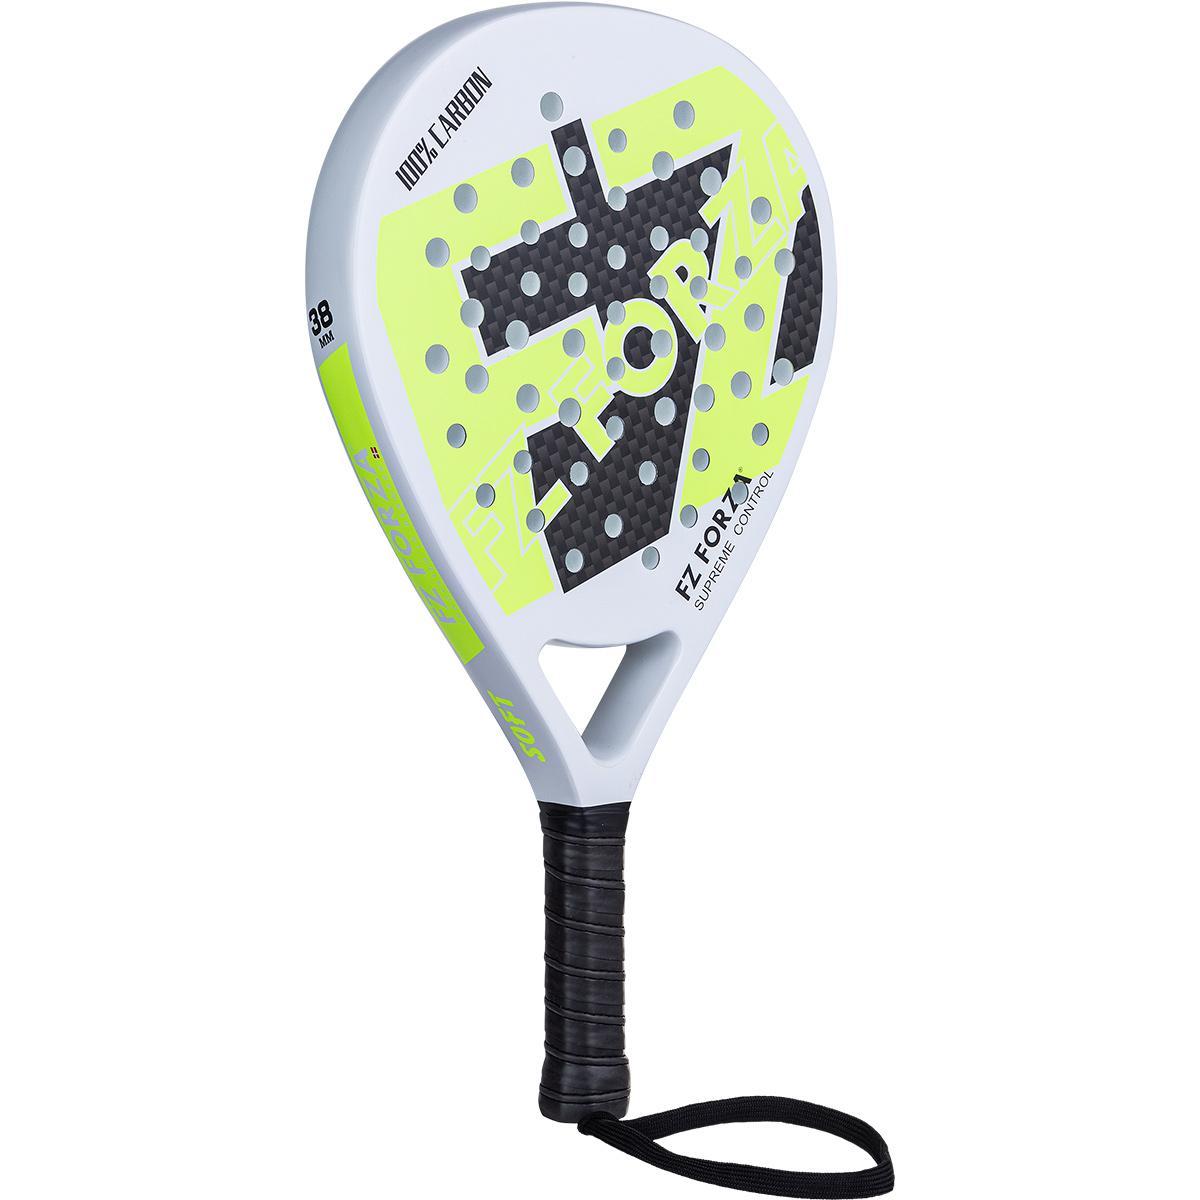 Forza Padel Supreme Control, padletennis, tennis